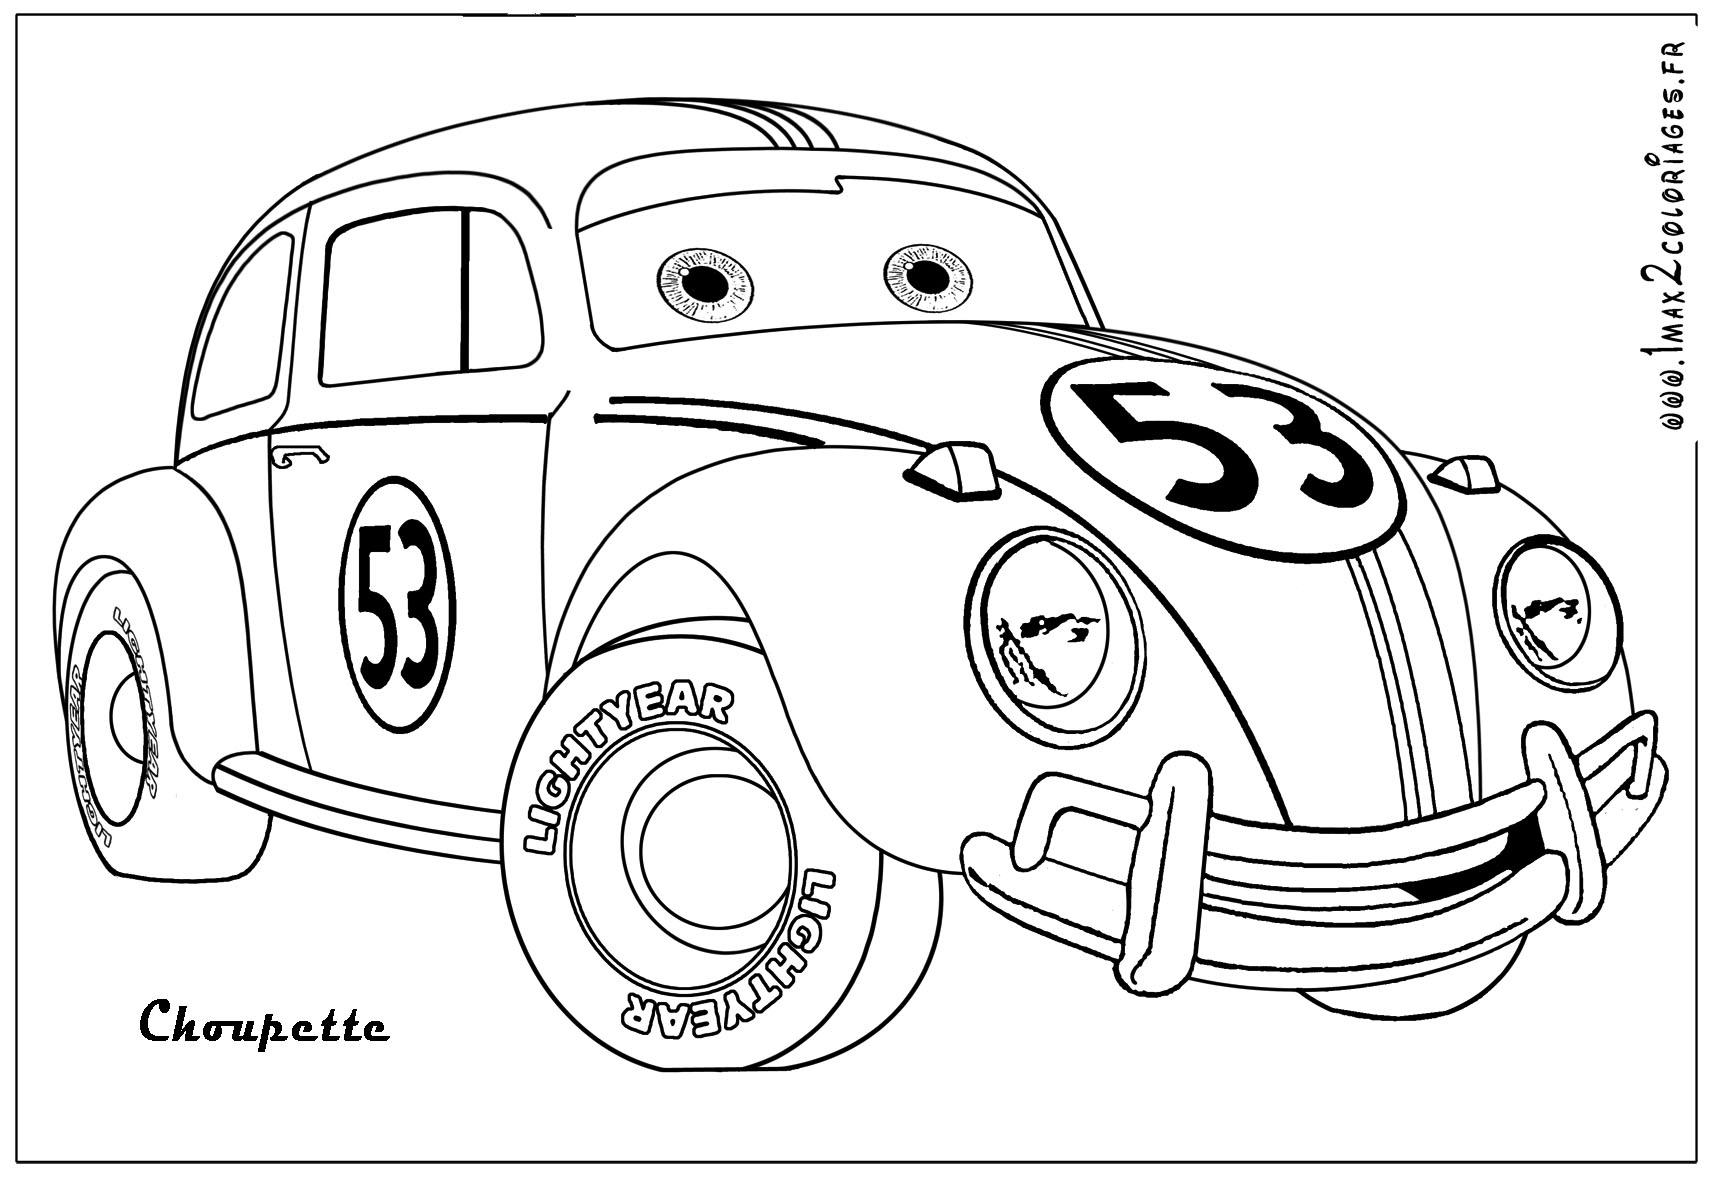 coloriages imprimer volkswagen num ro 105392. Black Bedroom Furniture Sets. Home Design Ideas